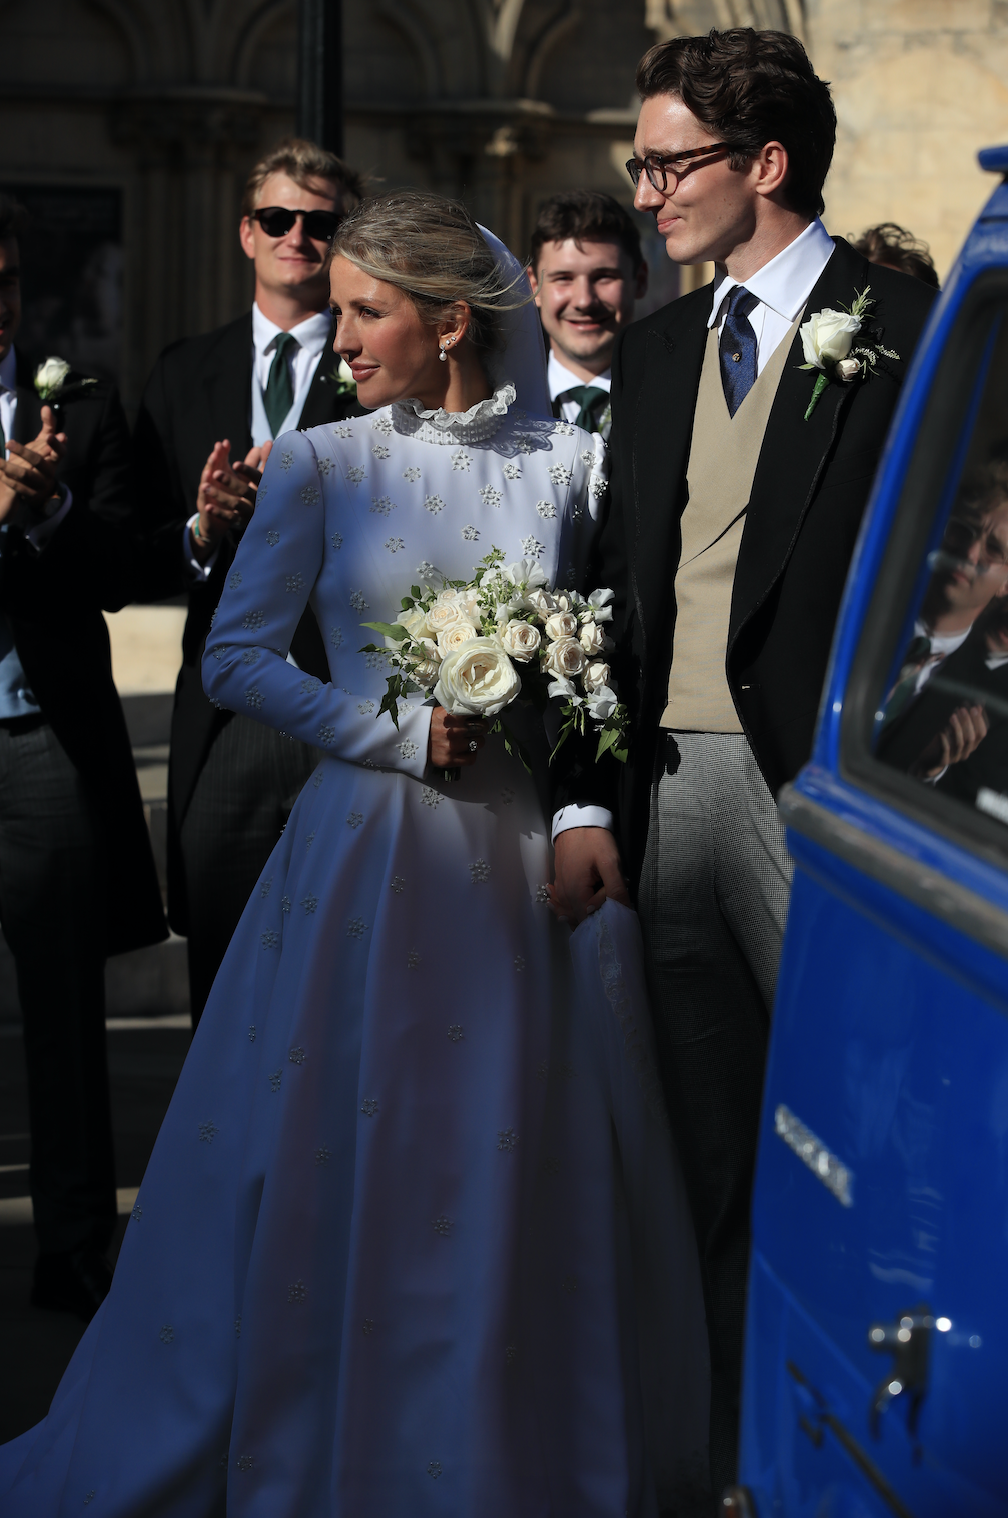 Newly married Ellie Goulding and Caspar Jopling leave York Minster after their wedding